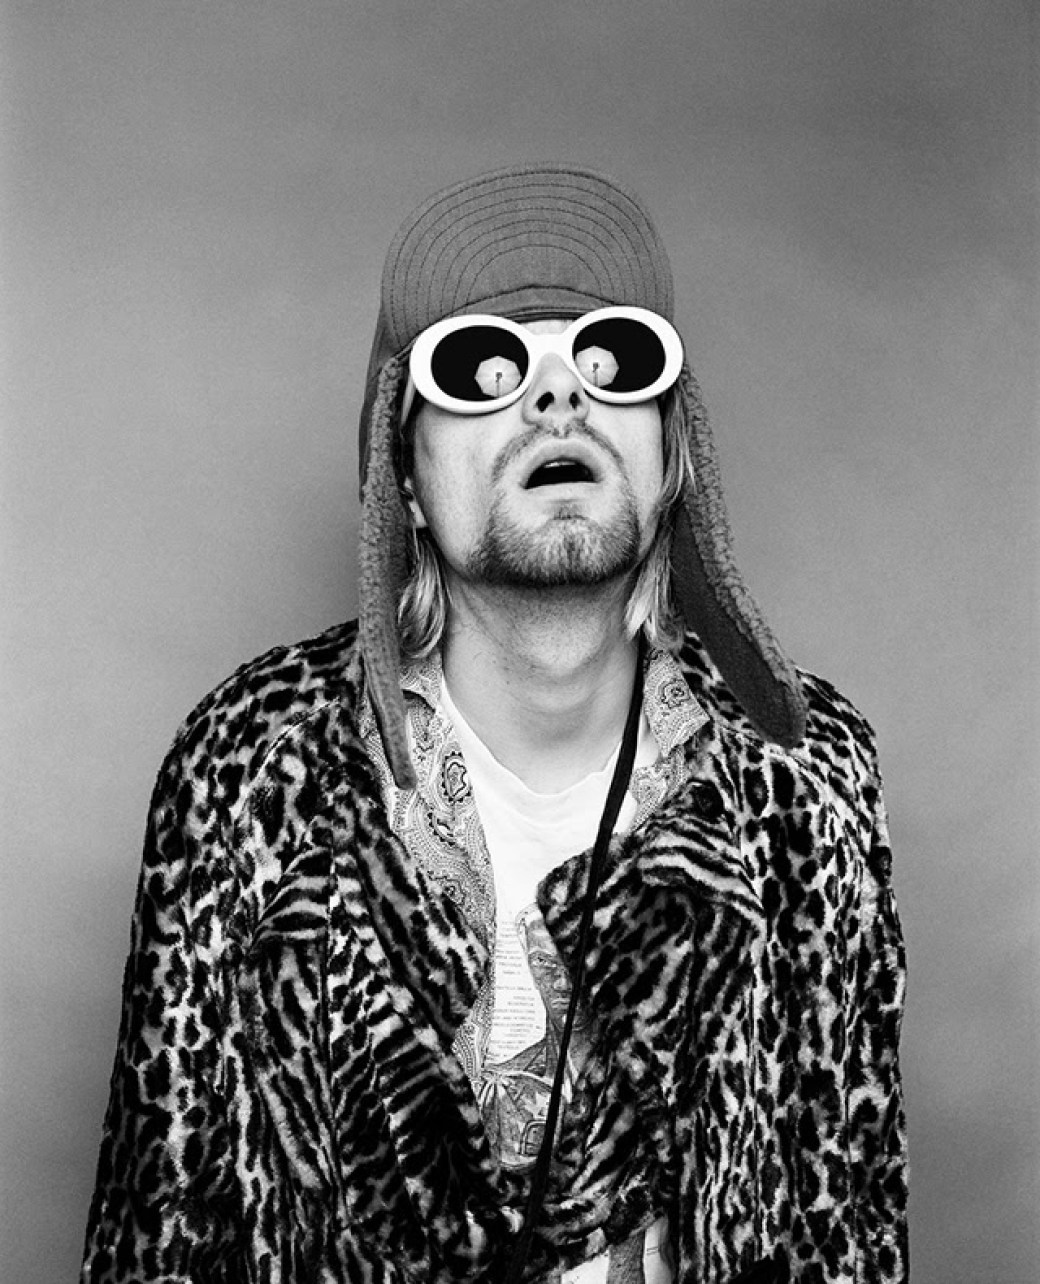 Kurt-Cobain-Sunglasses-blCK-AND-WHITE